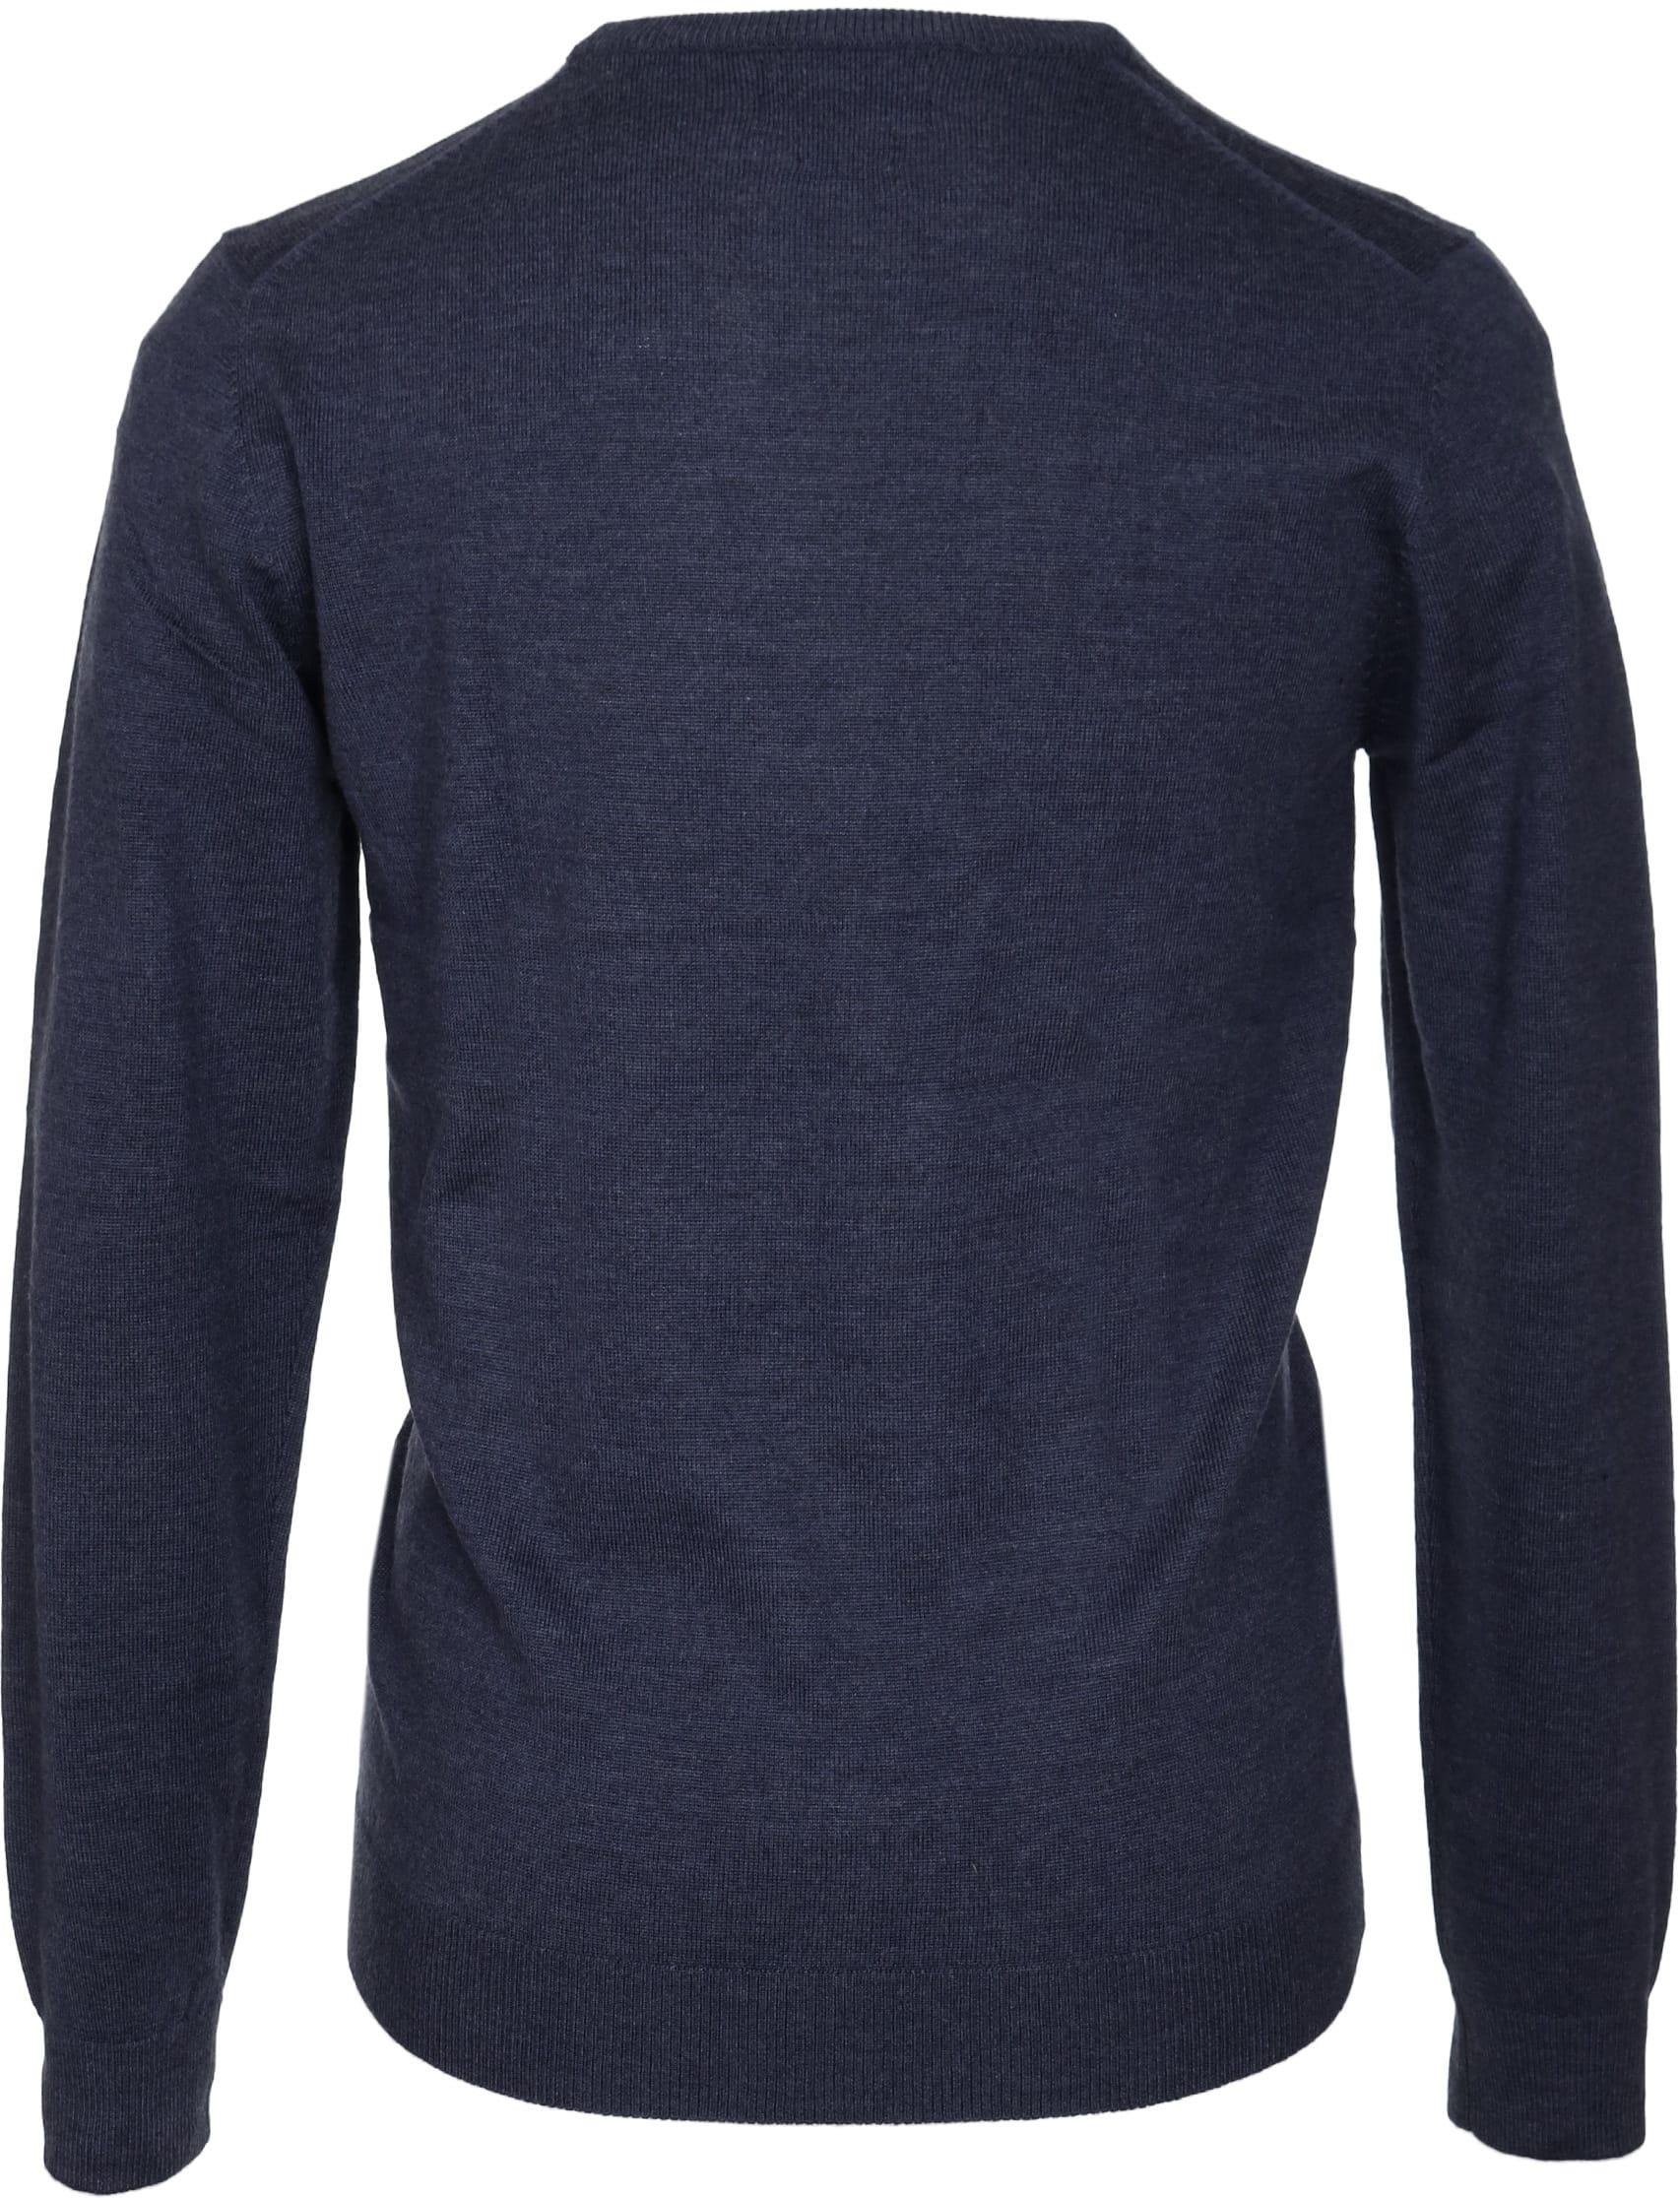 Profuomo Pullover O-Ausschnitt dunkelblau foto 2